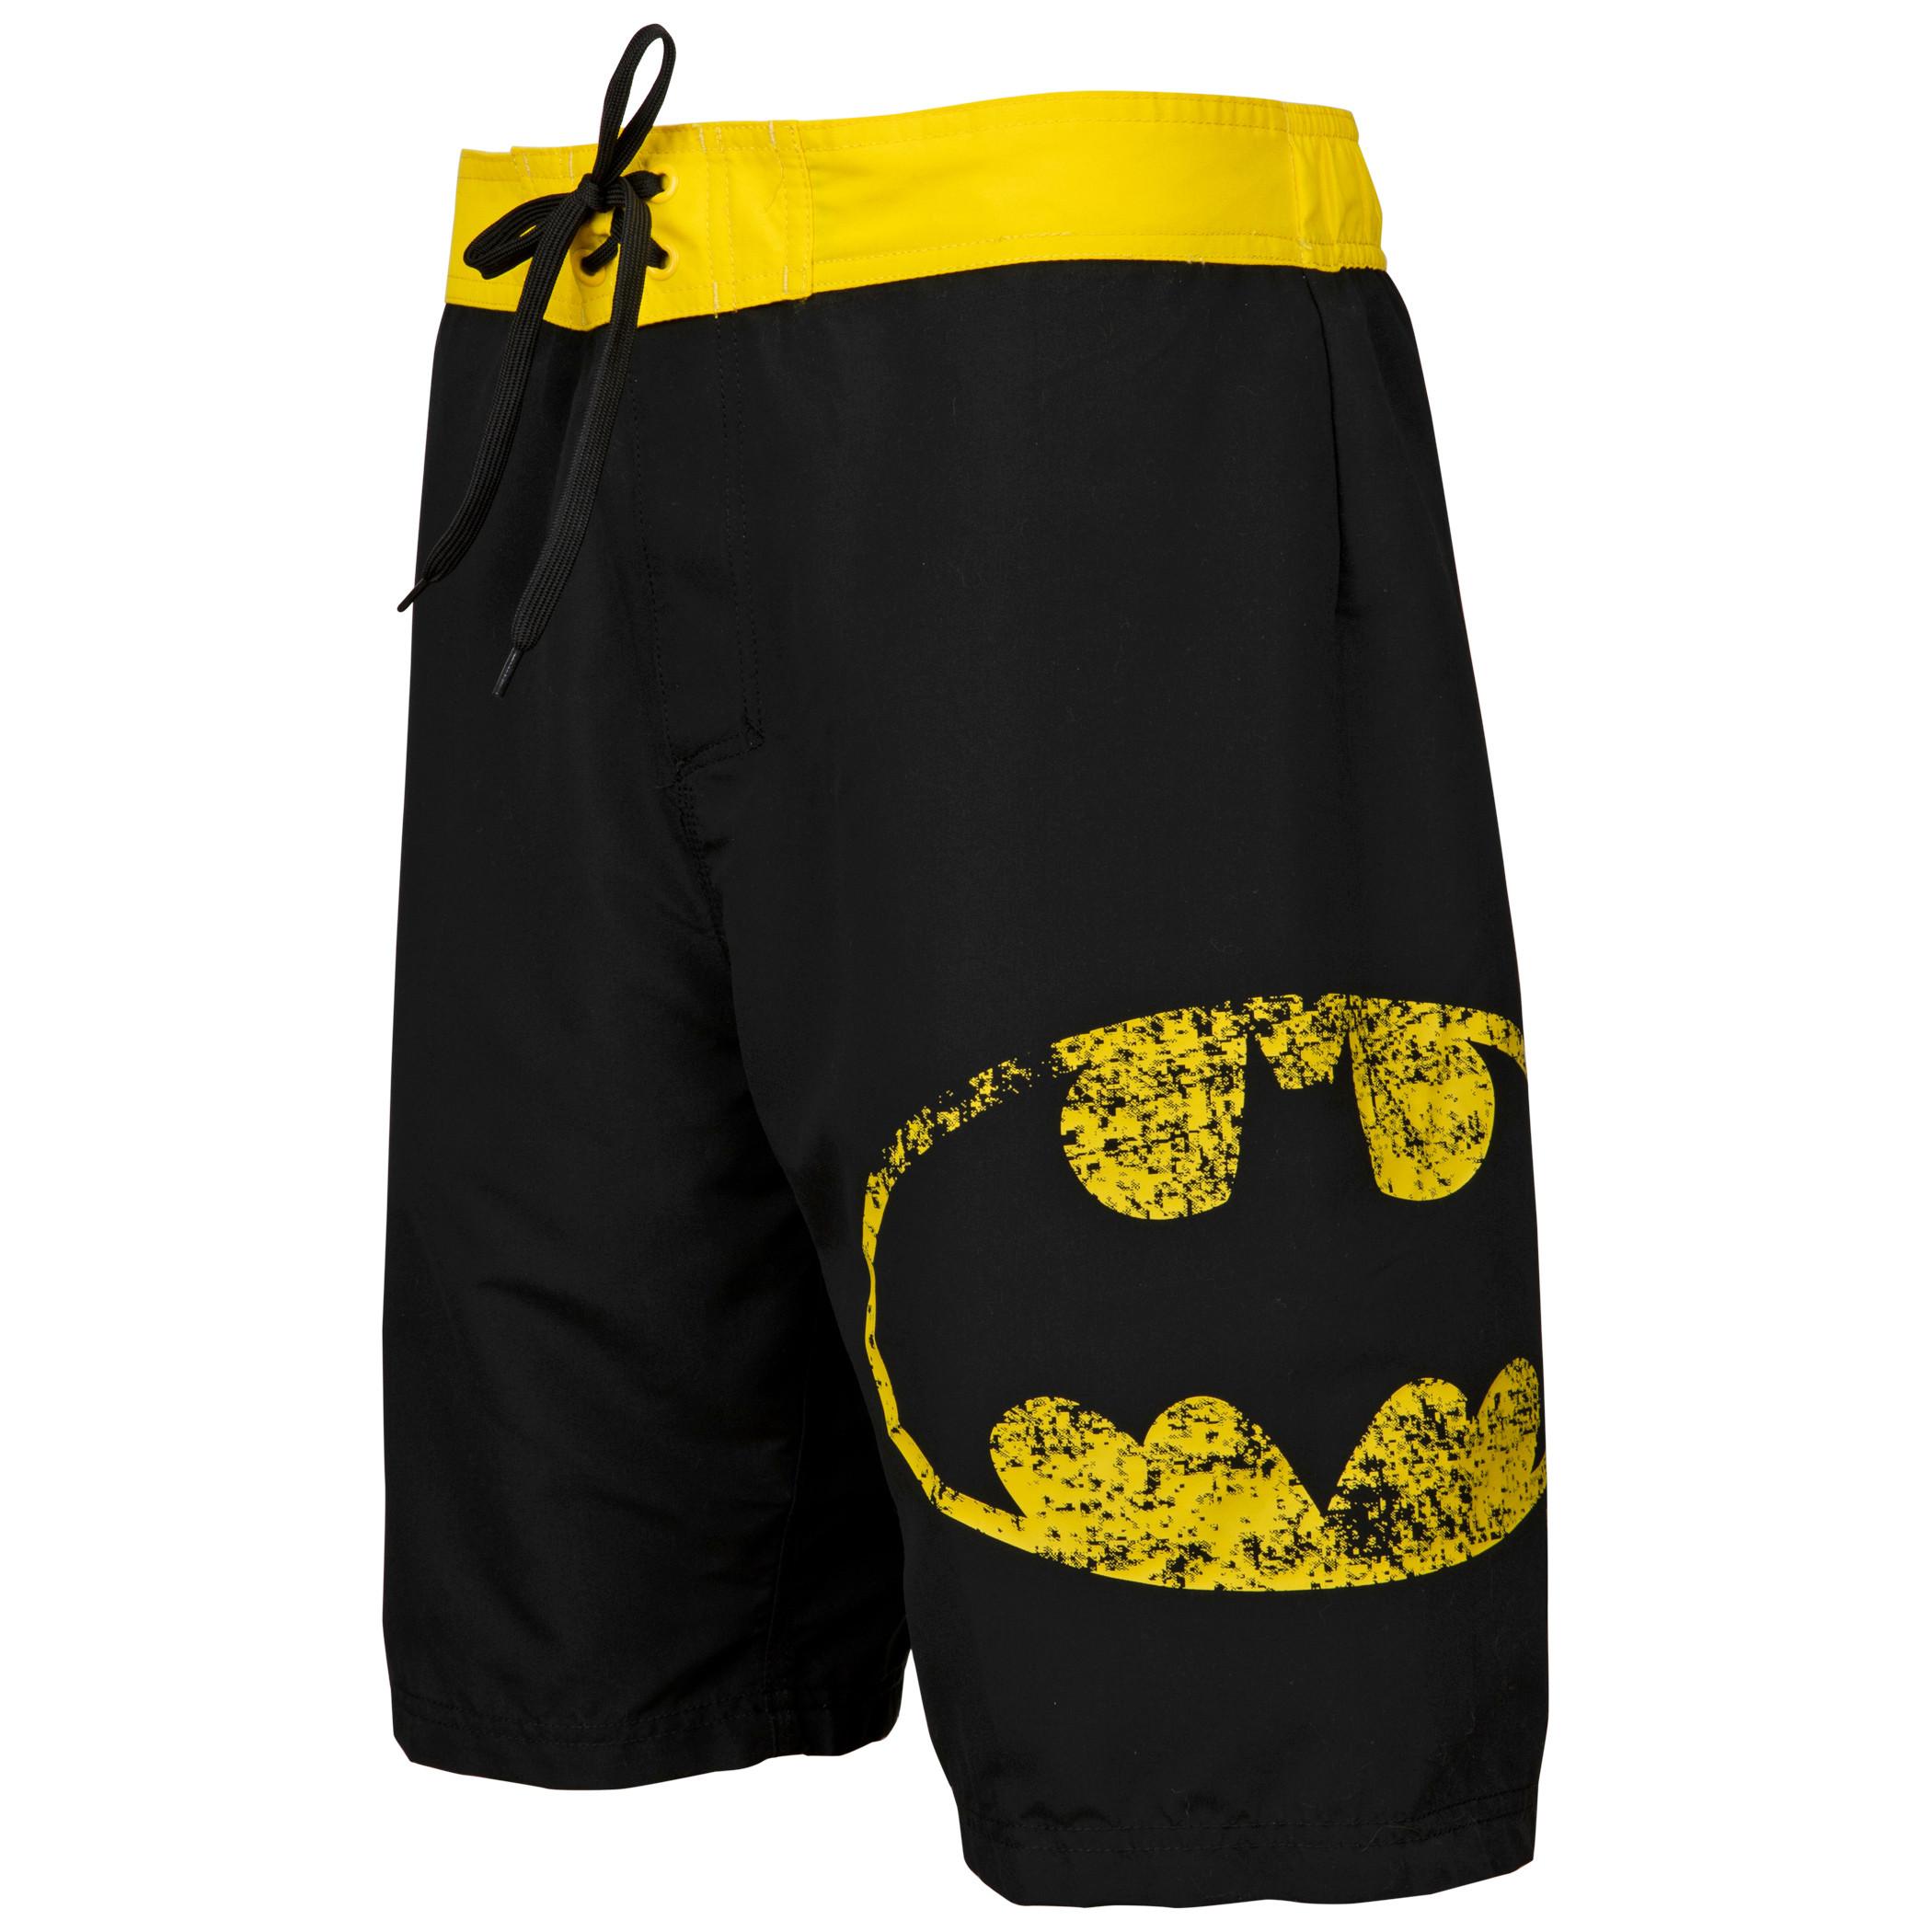 Batman Symbol Heather Black Board Shorts